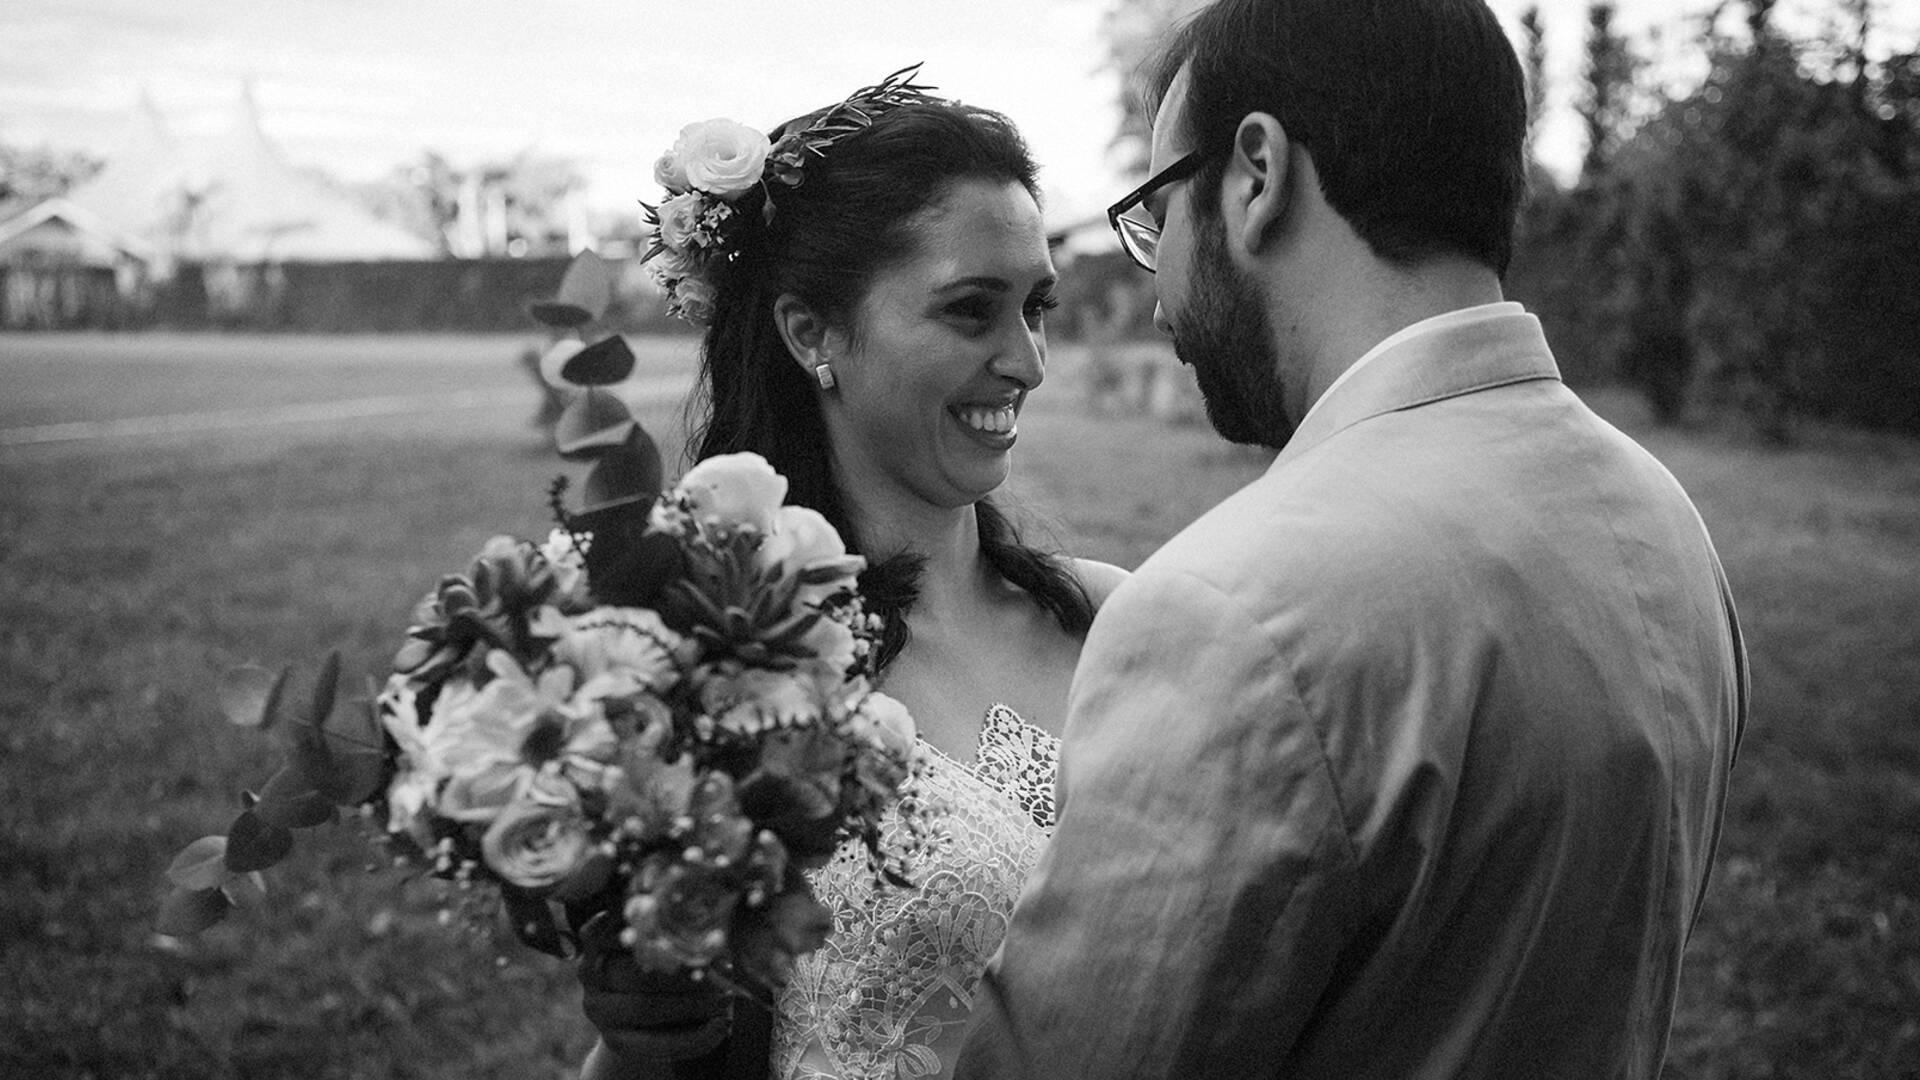 Casamentos de Sítio Pedaço do Paraíso - Maíra e Gustavo